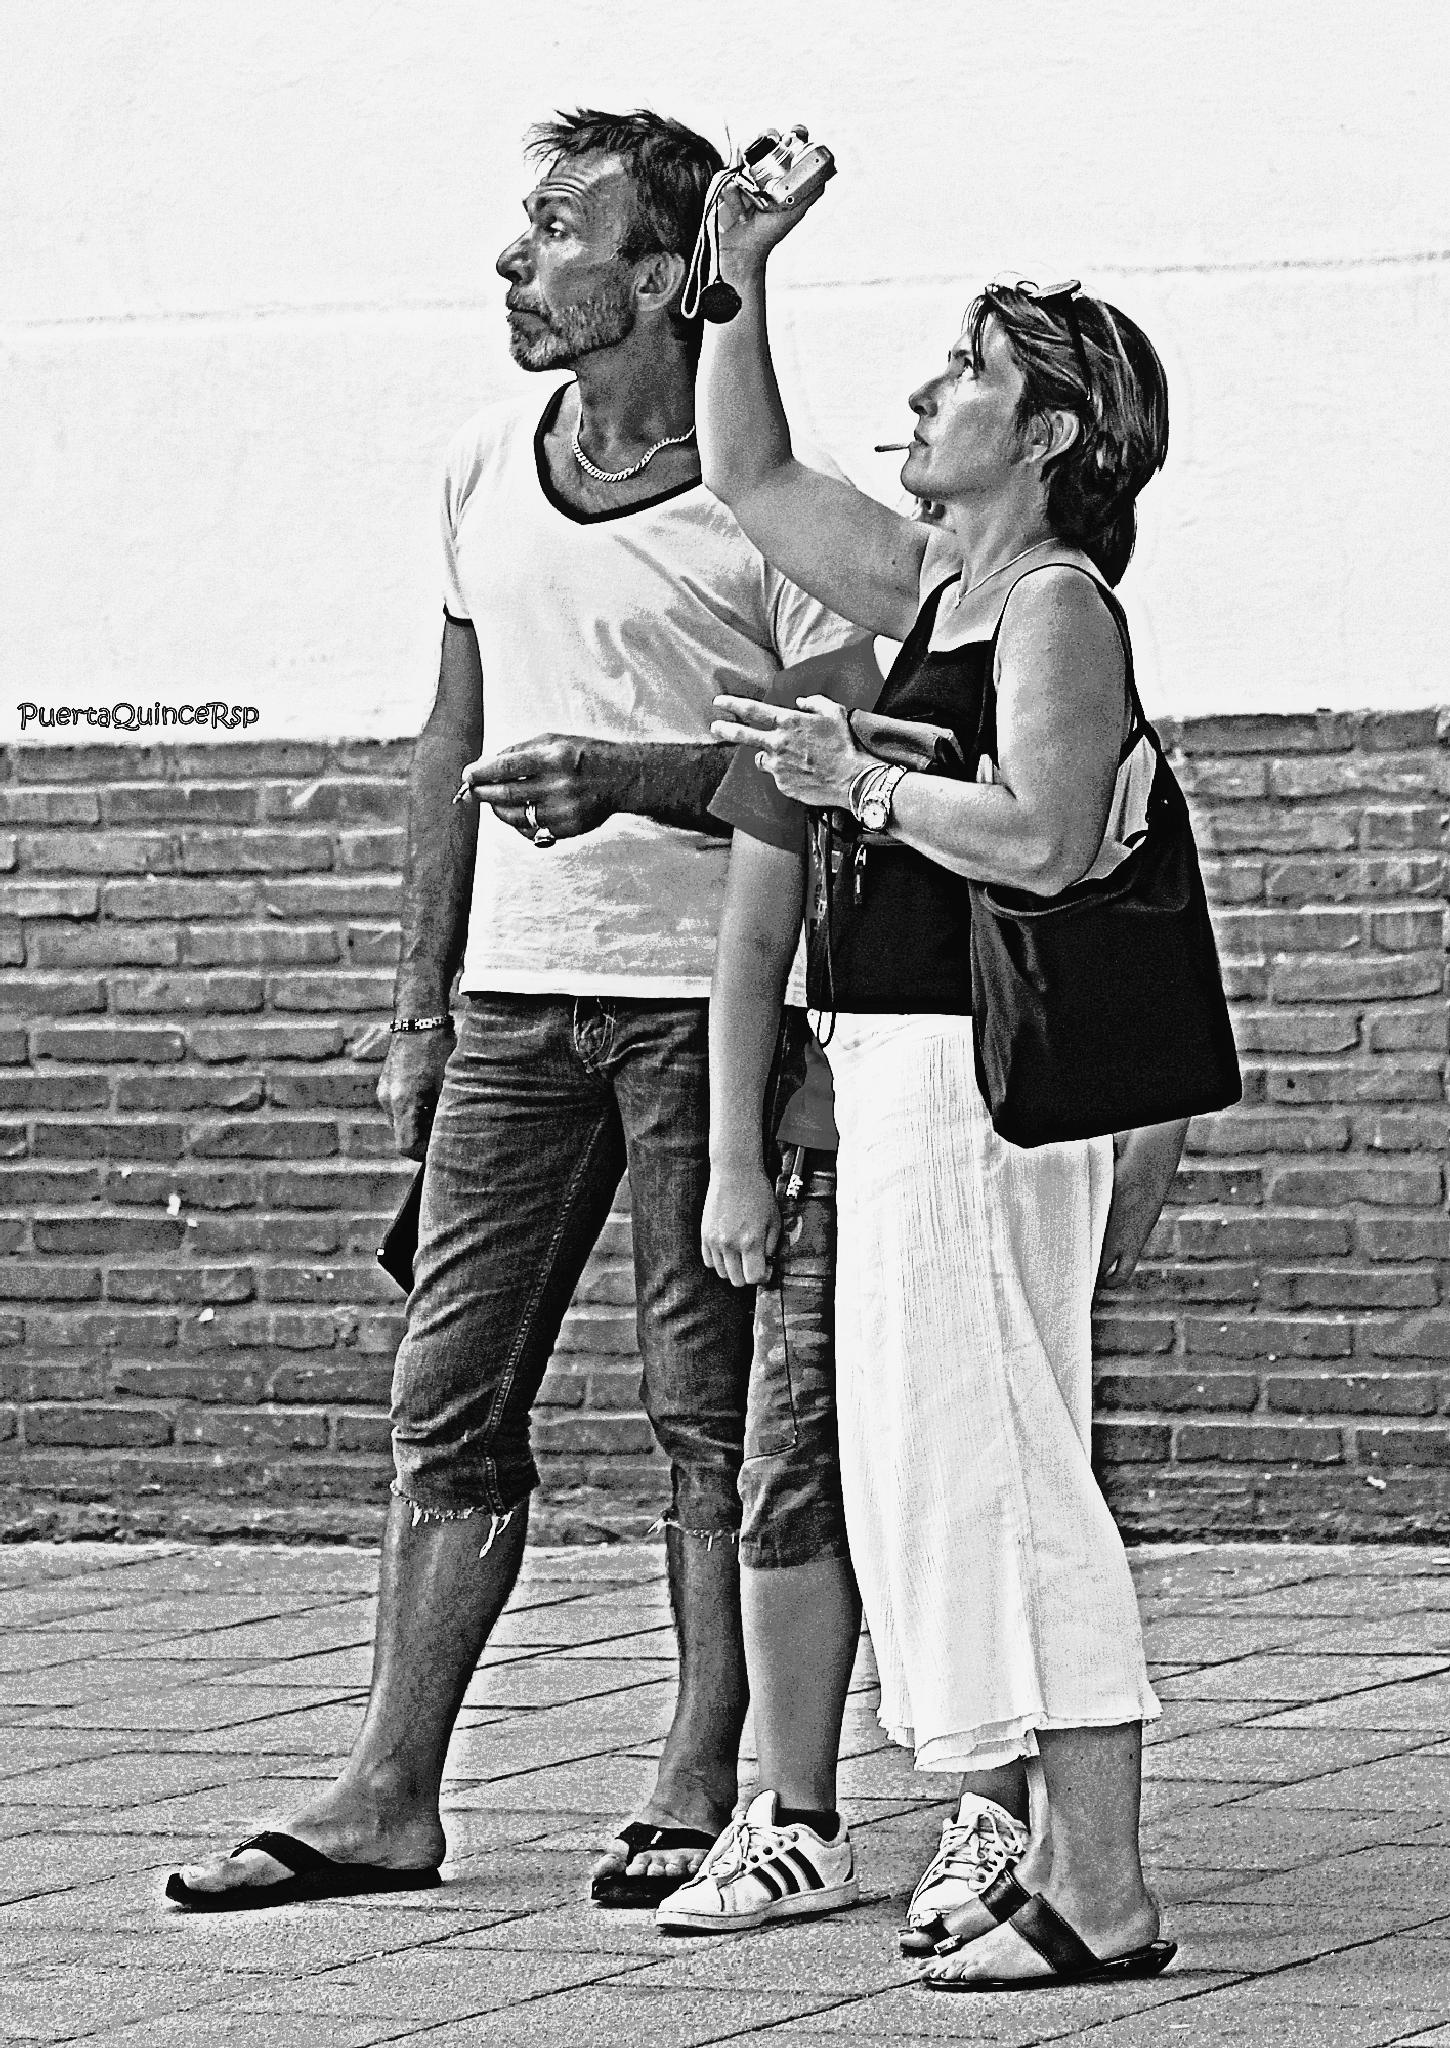 6 pies , 5 brazos, 2 cabezas by PuertaQuinceRsp